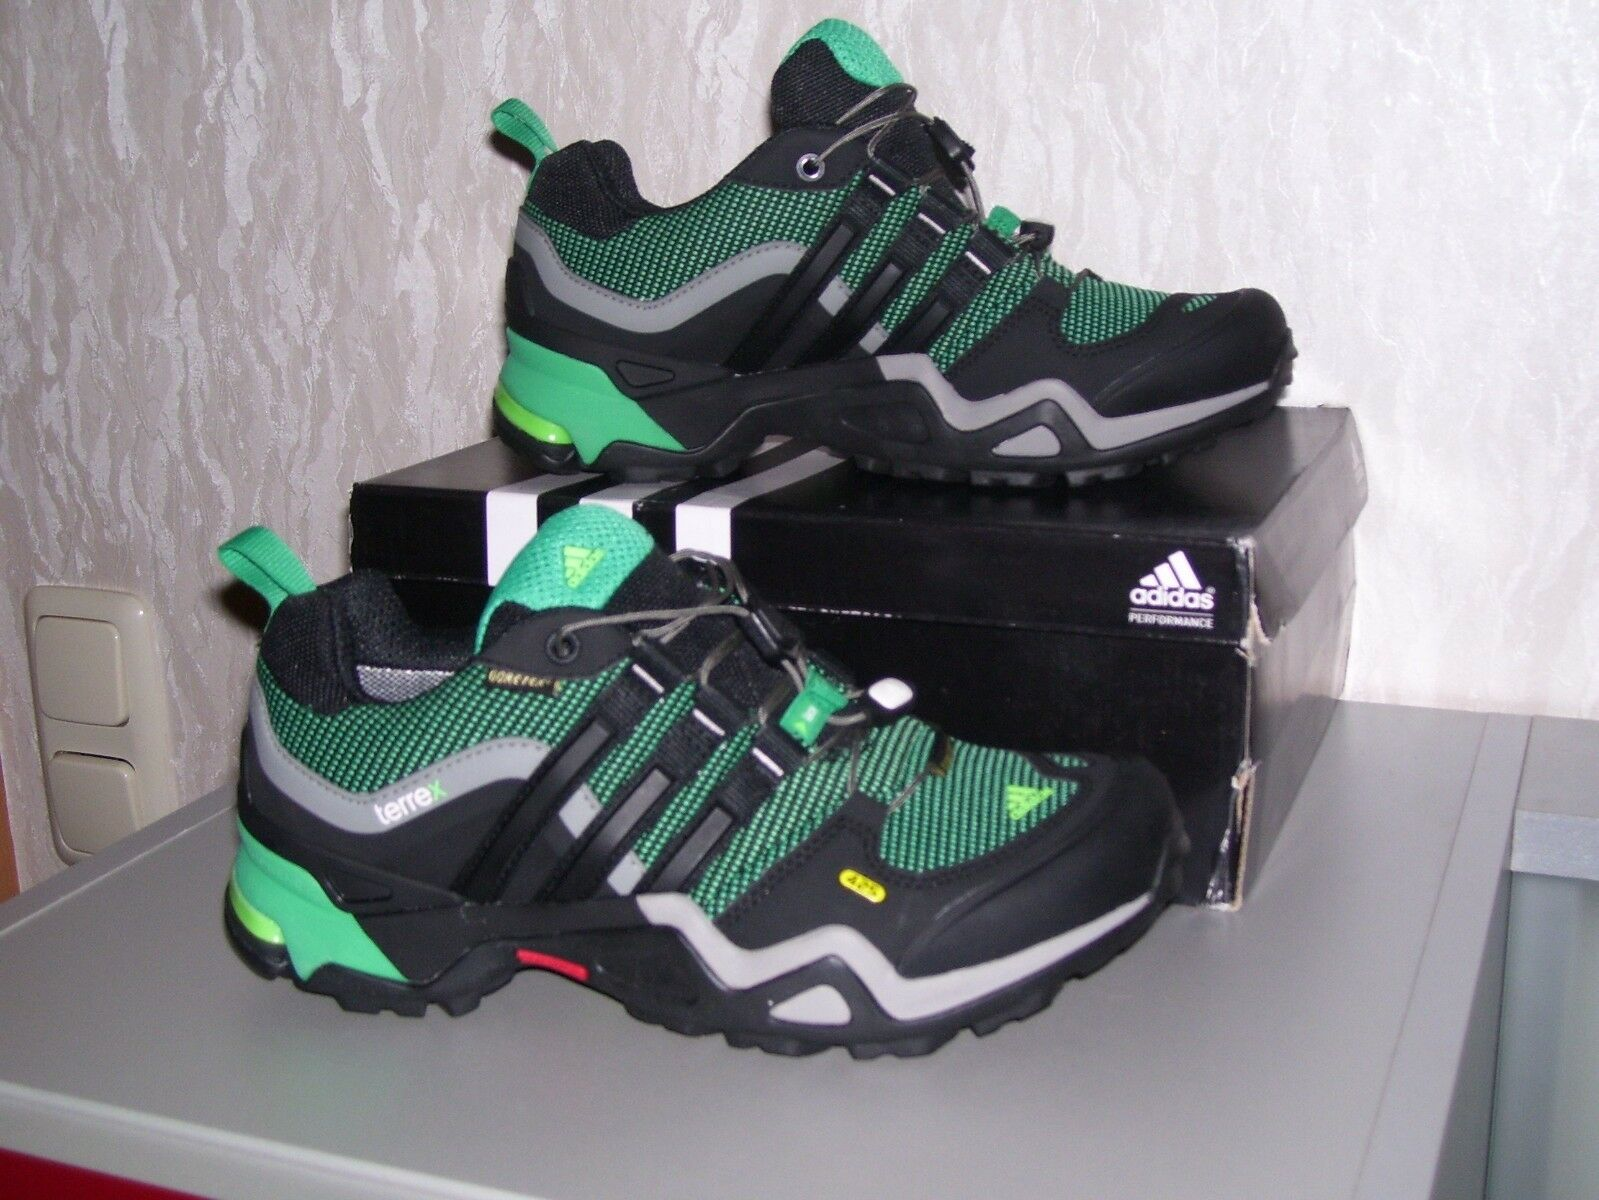 Adidas Terrex Fast X GTX W DaSie Trekking Schuhe Wanderschuhe EUR 36 UK4  neu